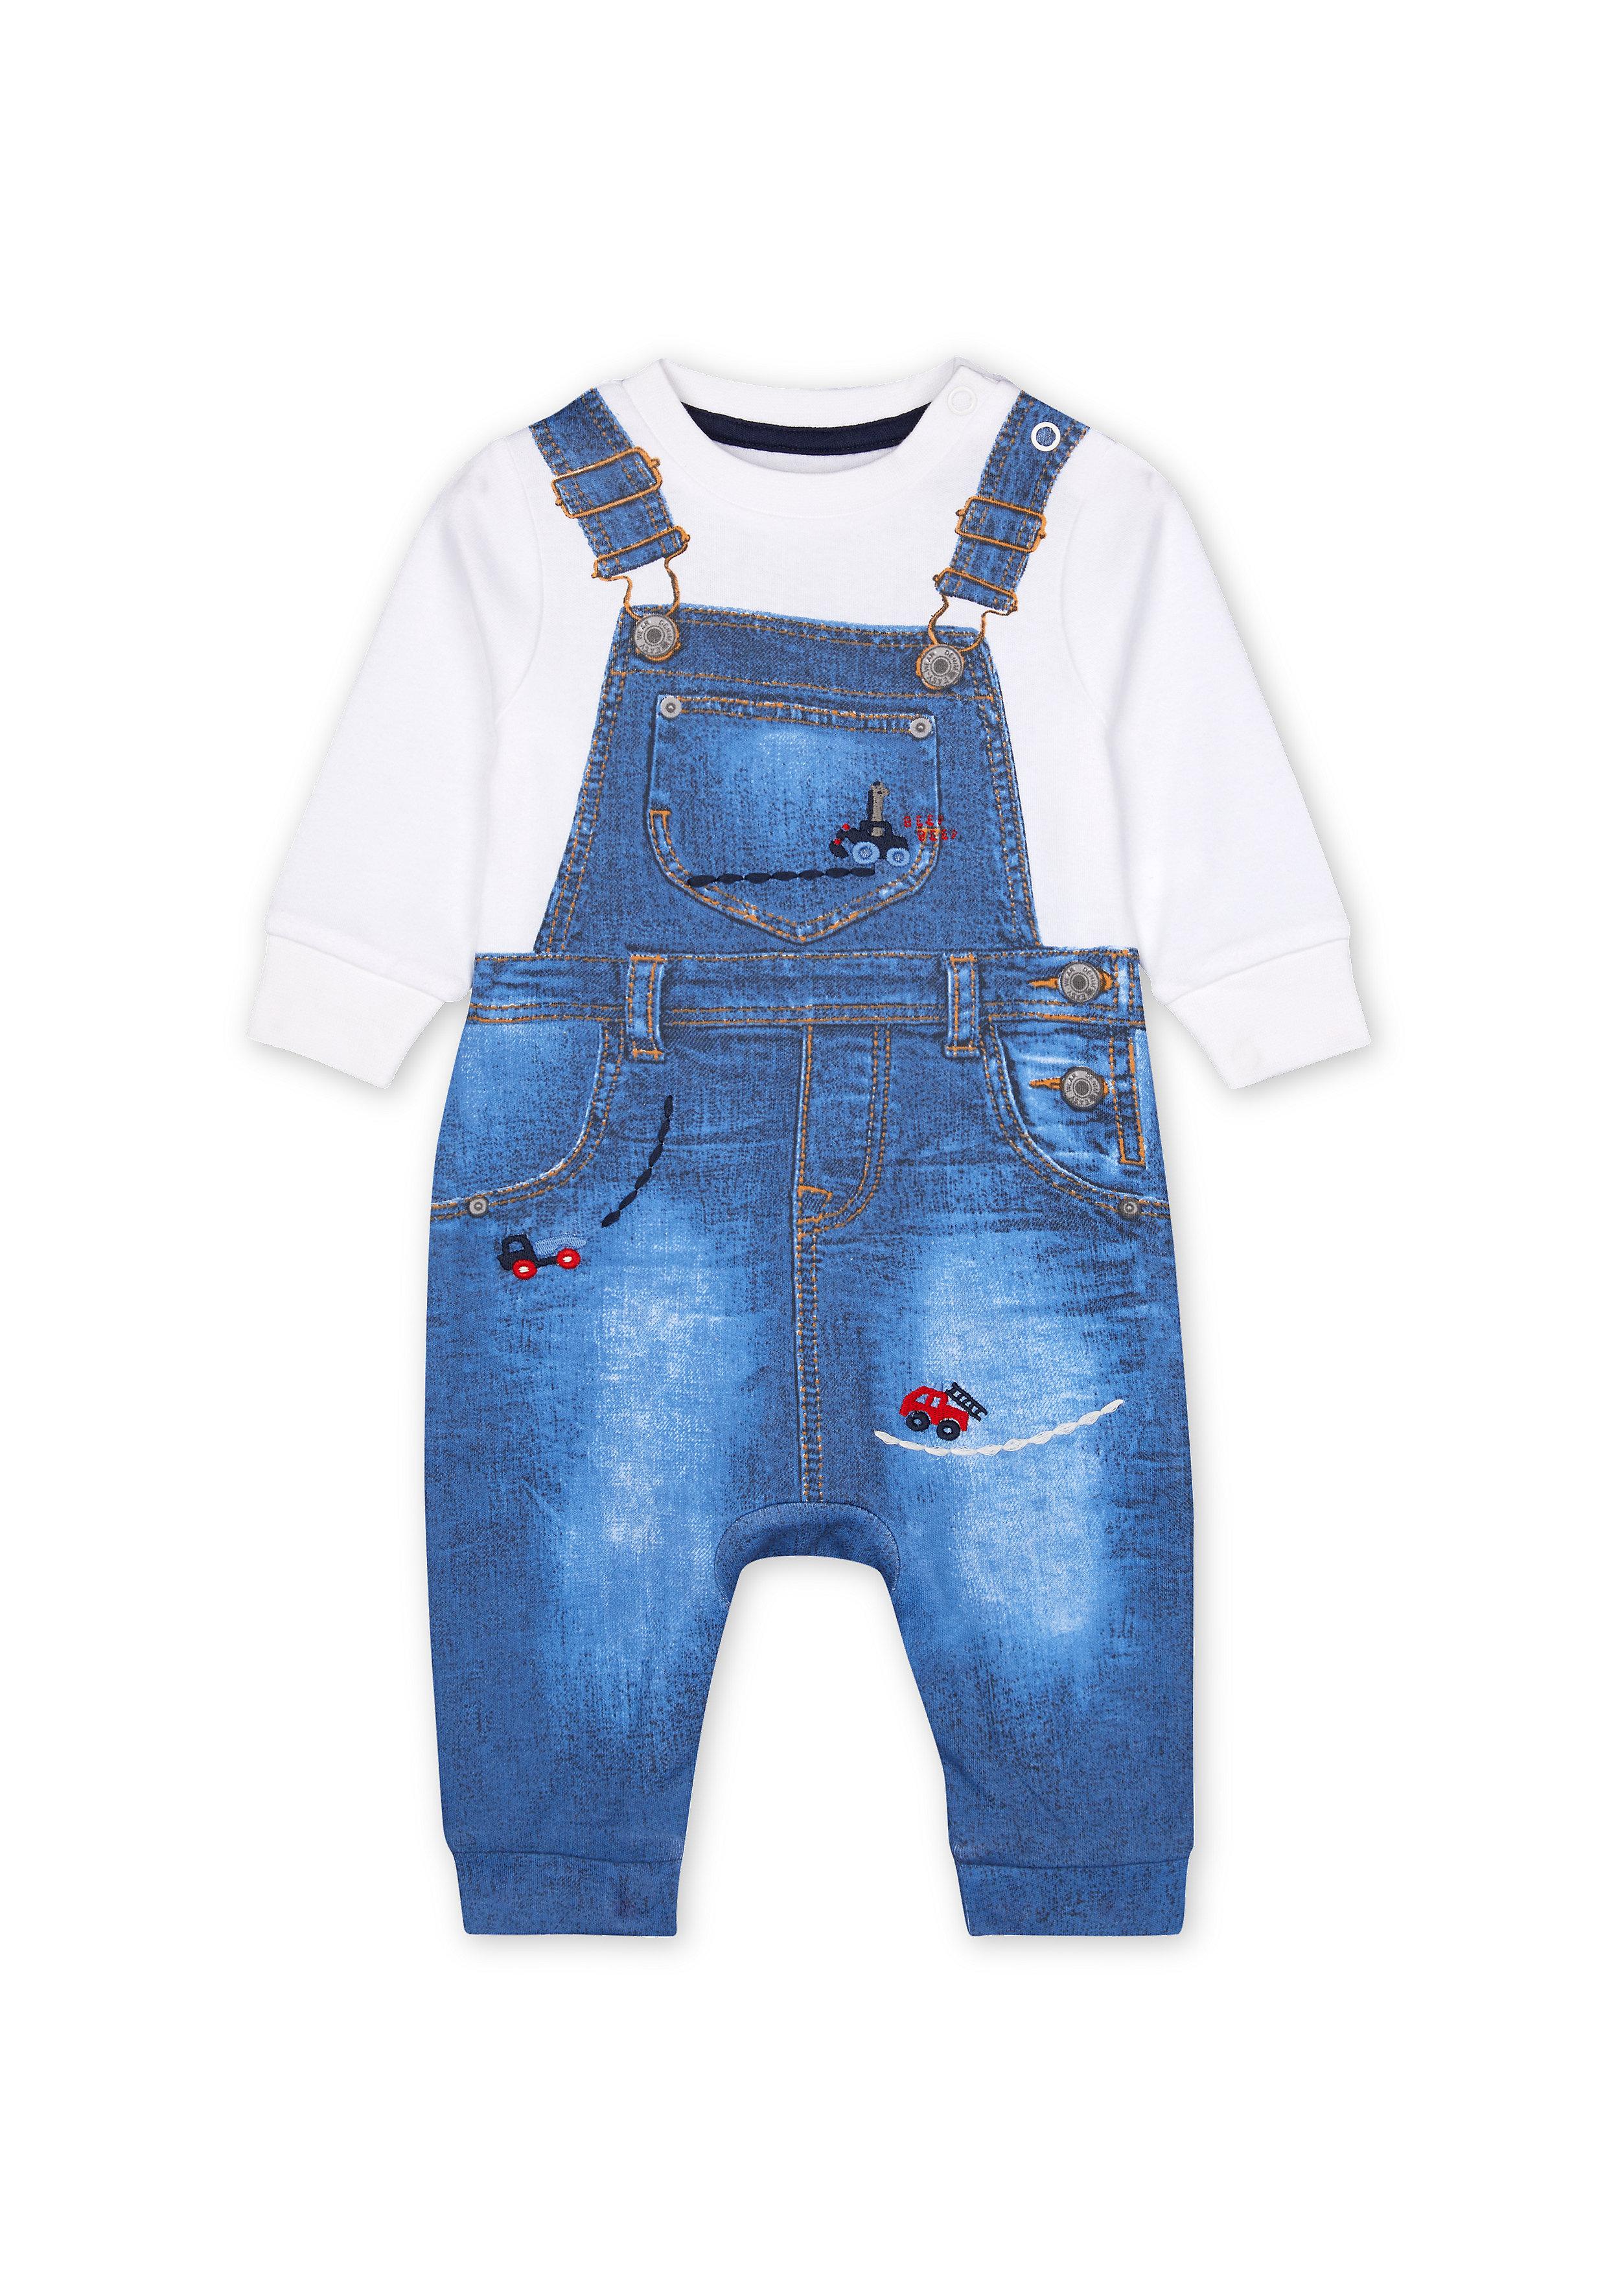 Mothercare   Boys Full sleeves Mock dungaree Romper - Blue